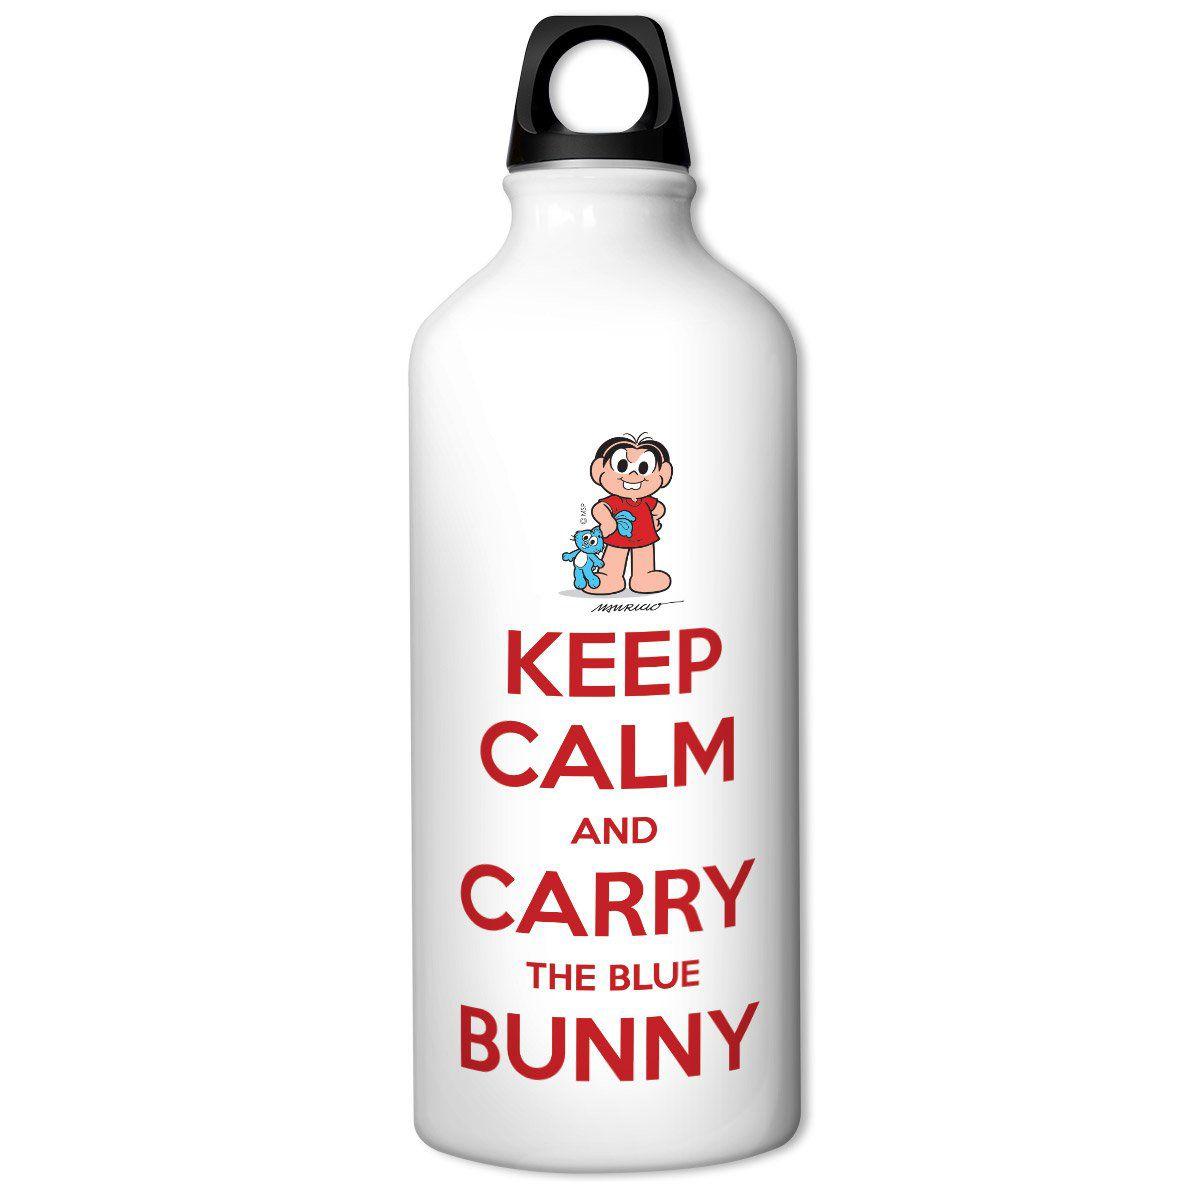 Squeeze Turma da Mônica Cool - Keep Calm And Carry The Blue Bunny